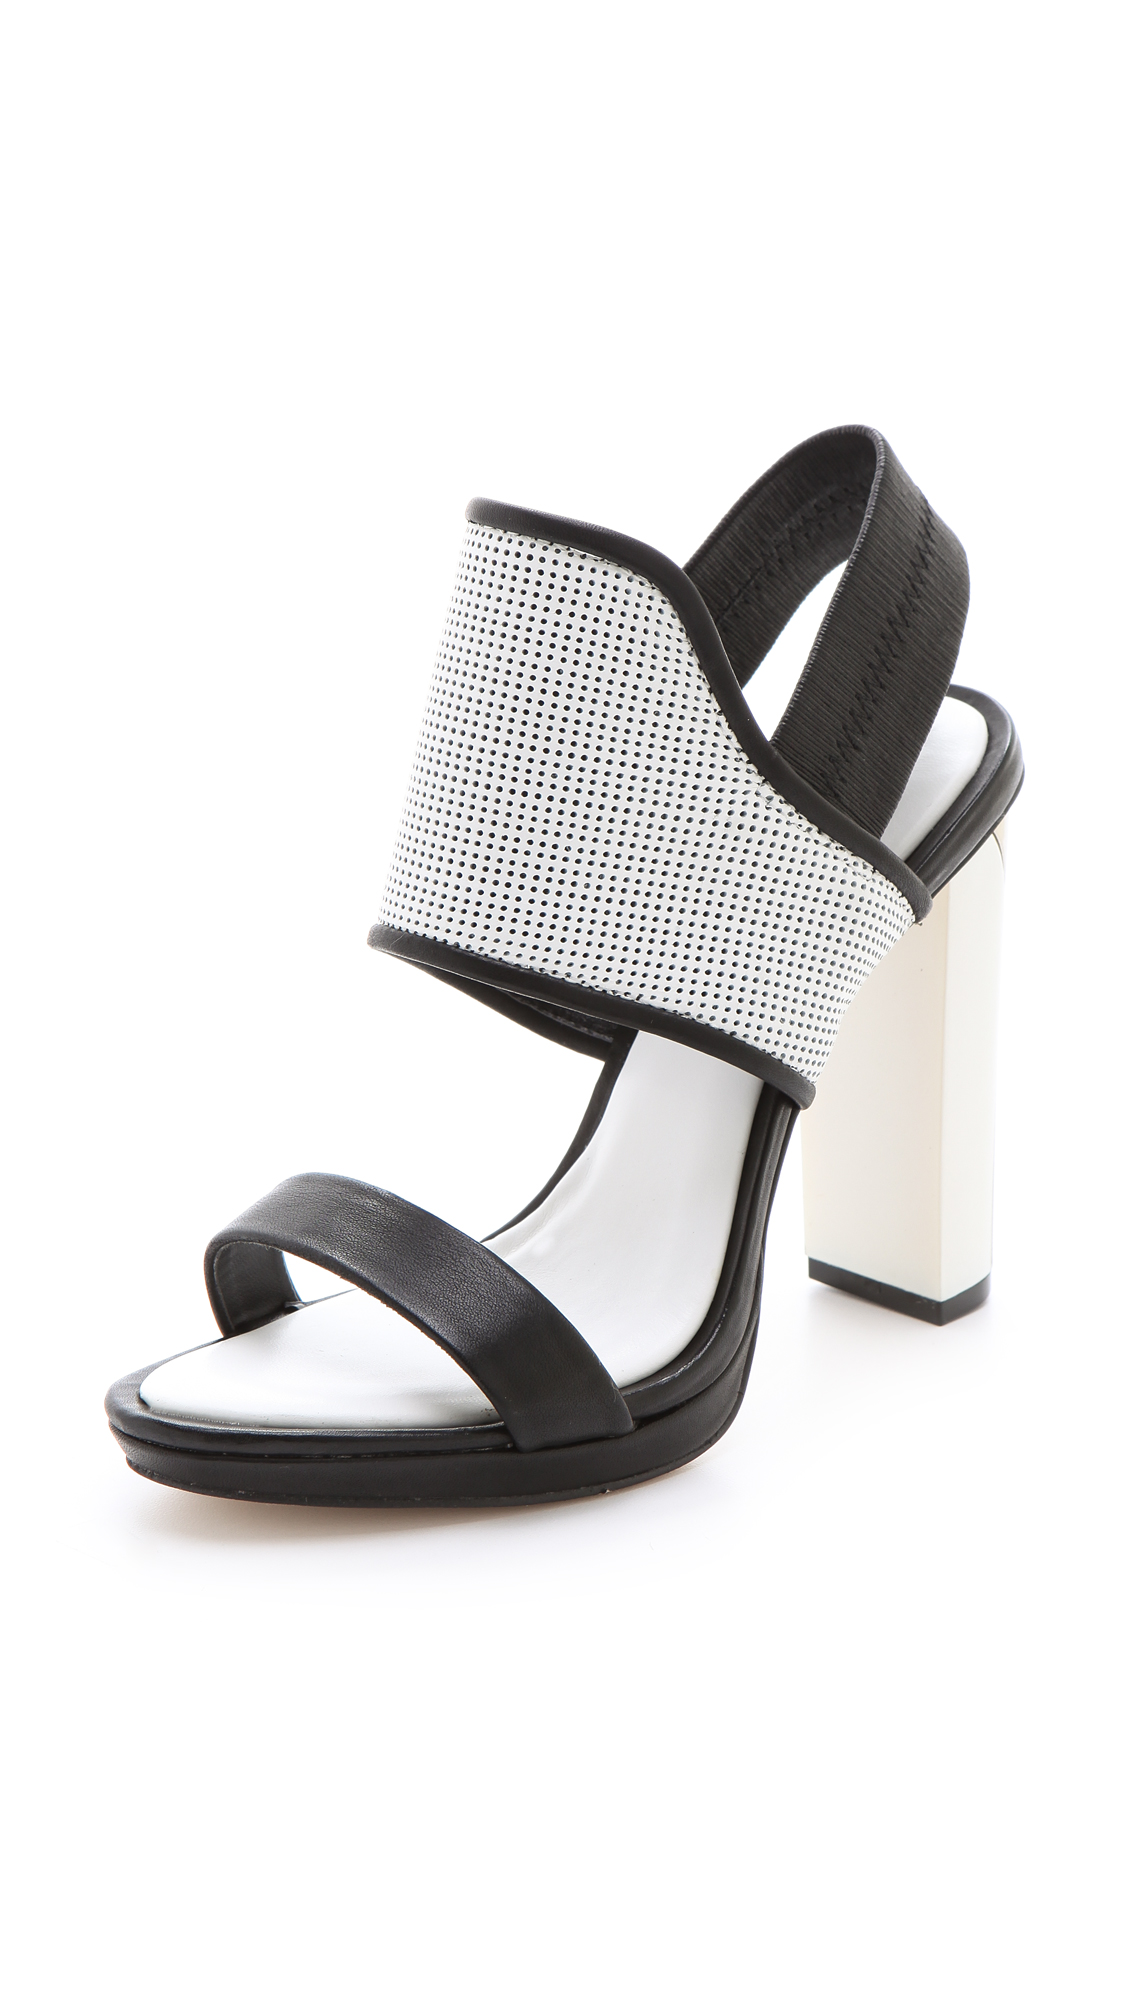 6d1dc5045ac BCBGMAXAZRIA Jovian High Heel Sandals